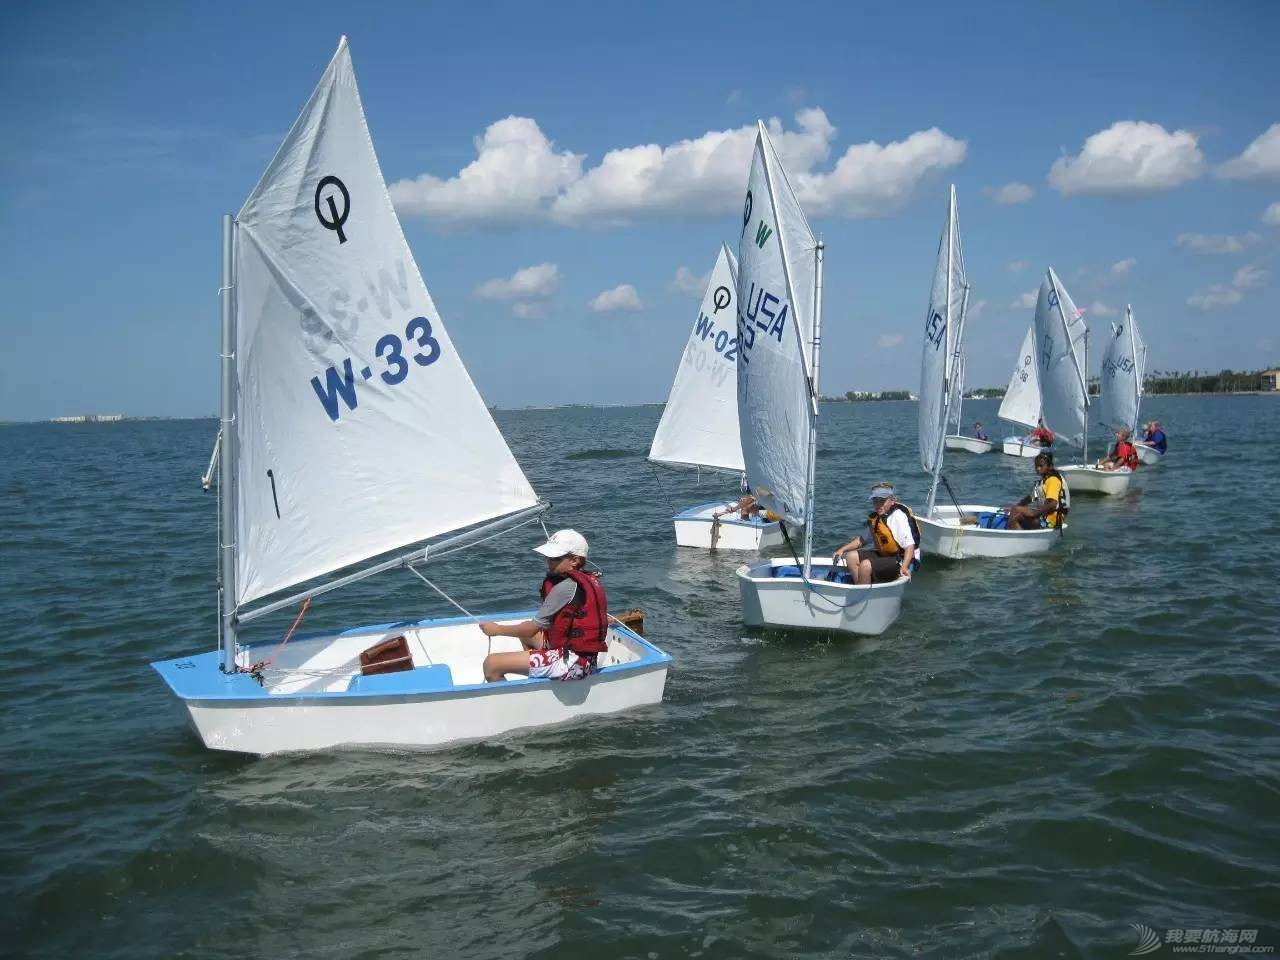 如何让孩子们爱上航海 21bc37d1ff1e341b416784964e4fa00b.jpg